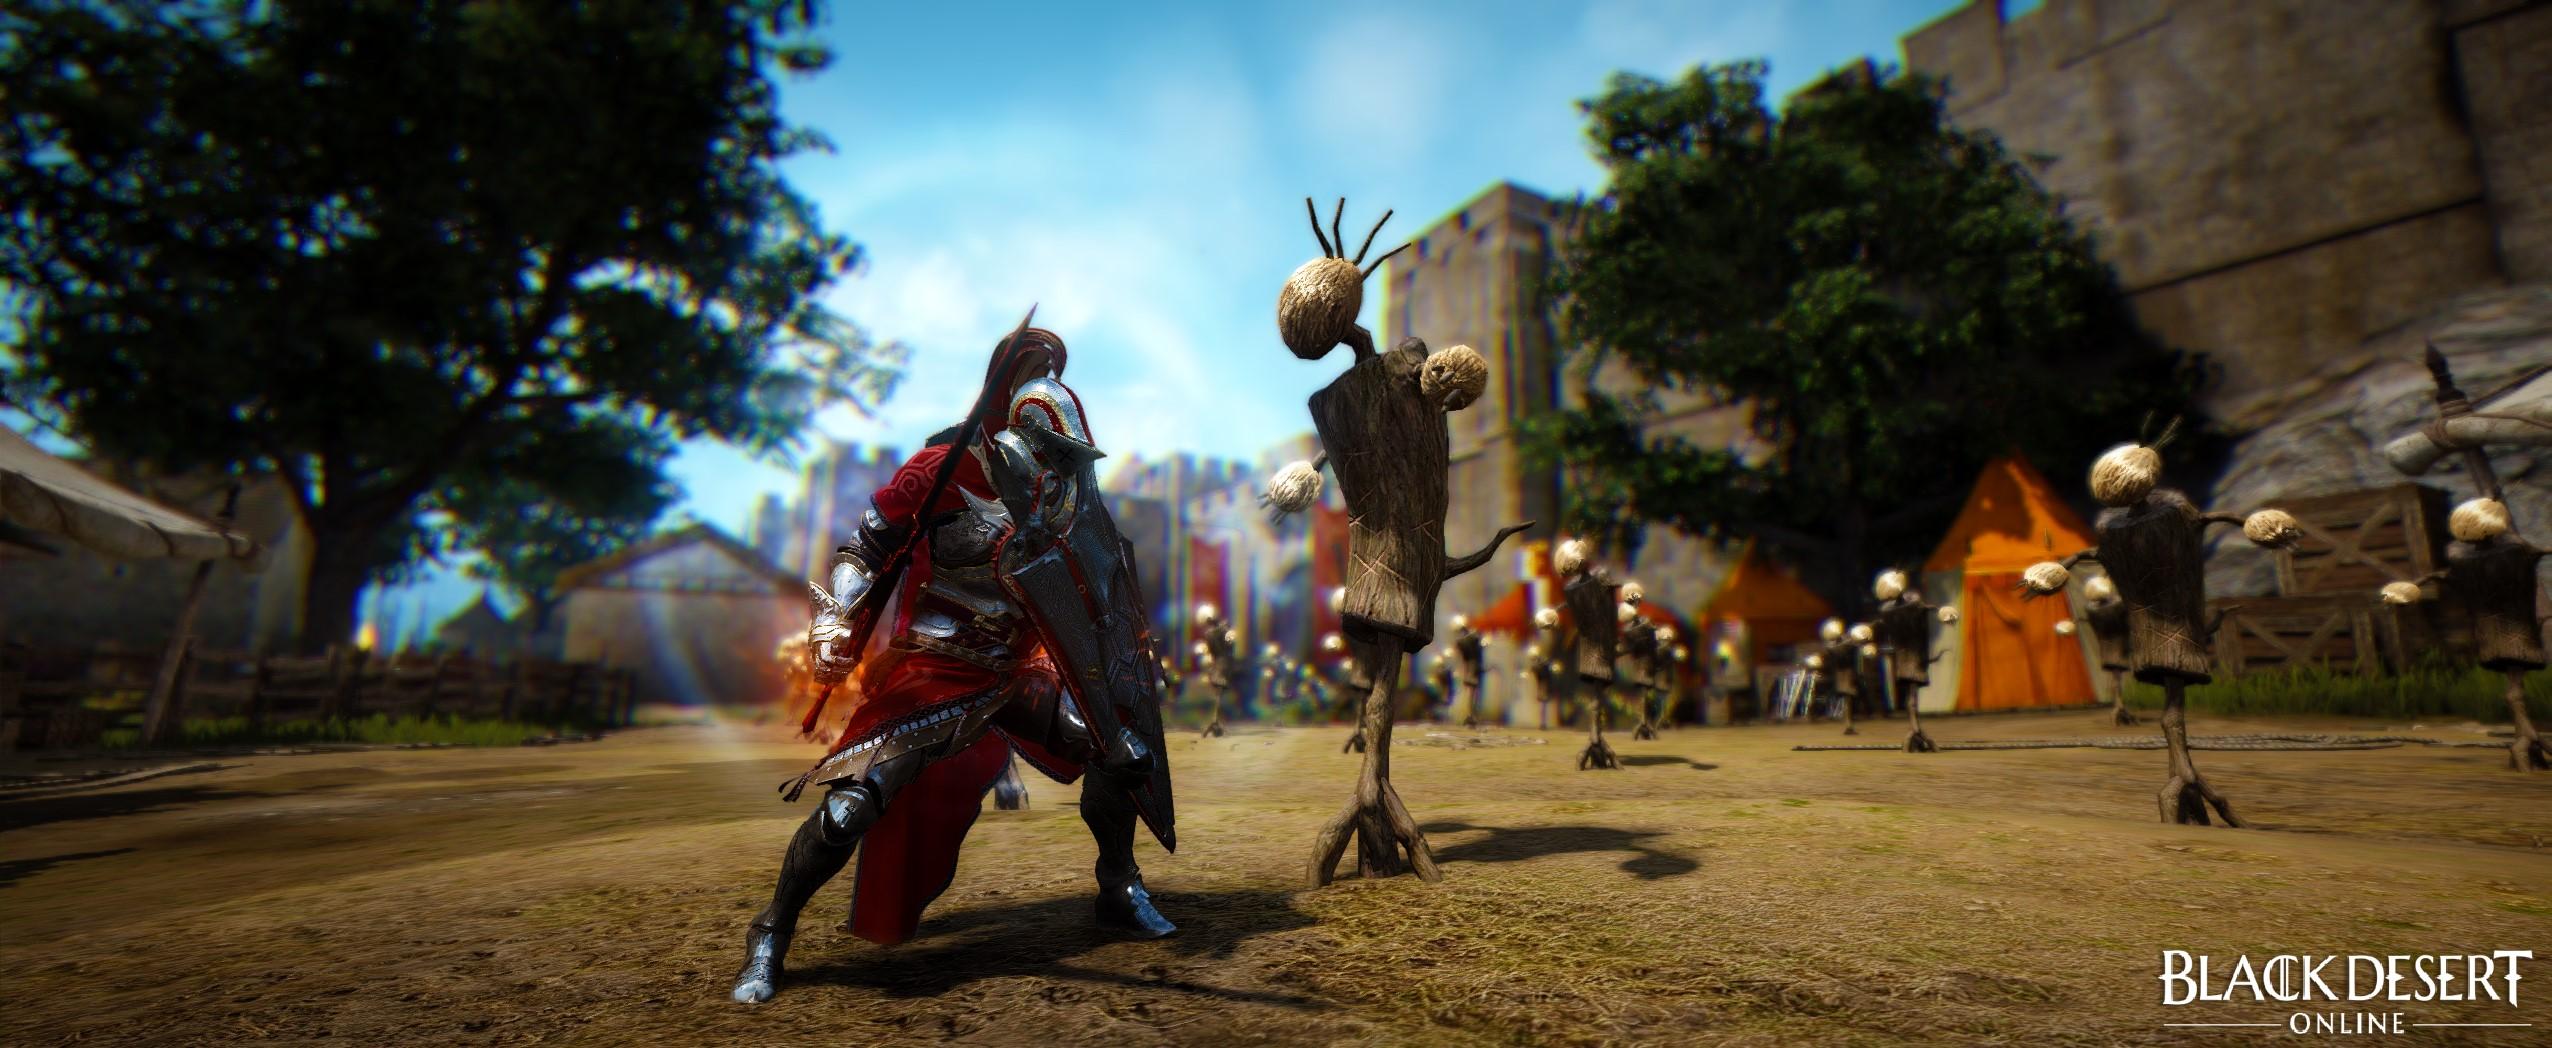 Spieler können im MMORPG Black Desert nun offiziell AFK-Leveln